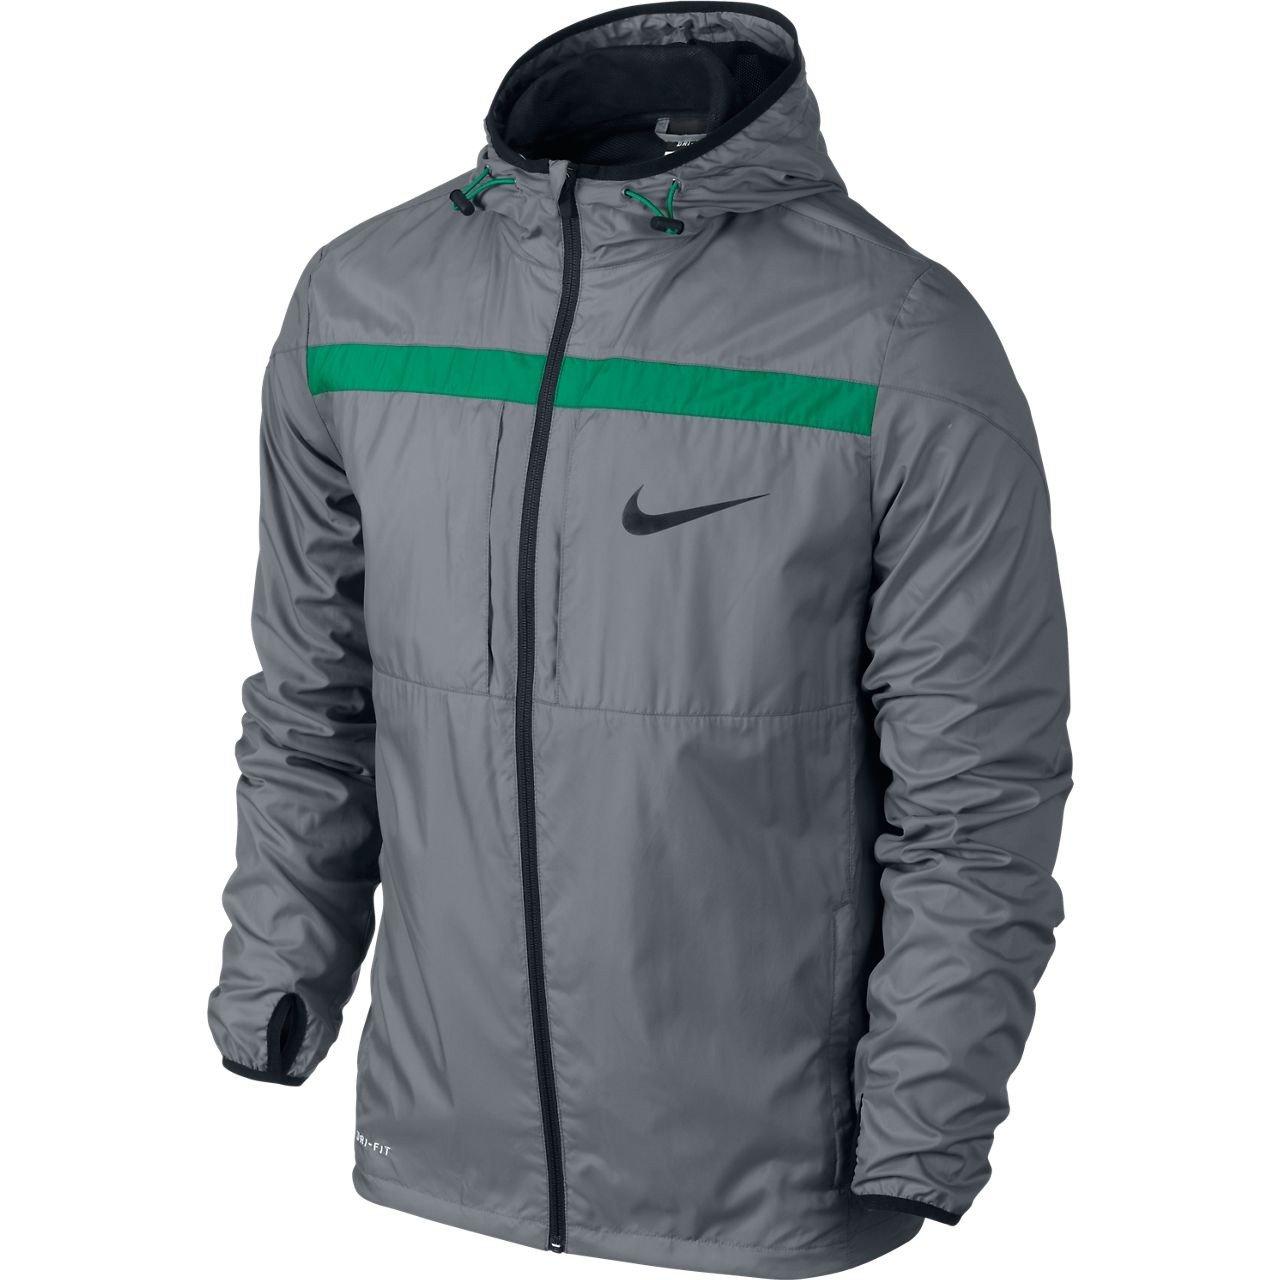 Nike Legend 7 Academy AG-PRO